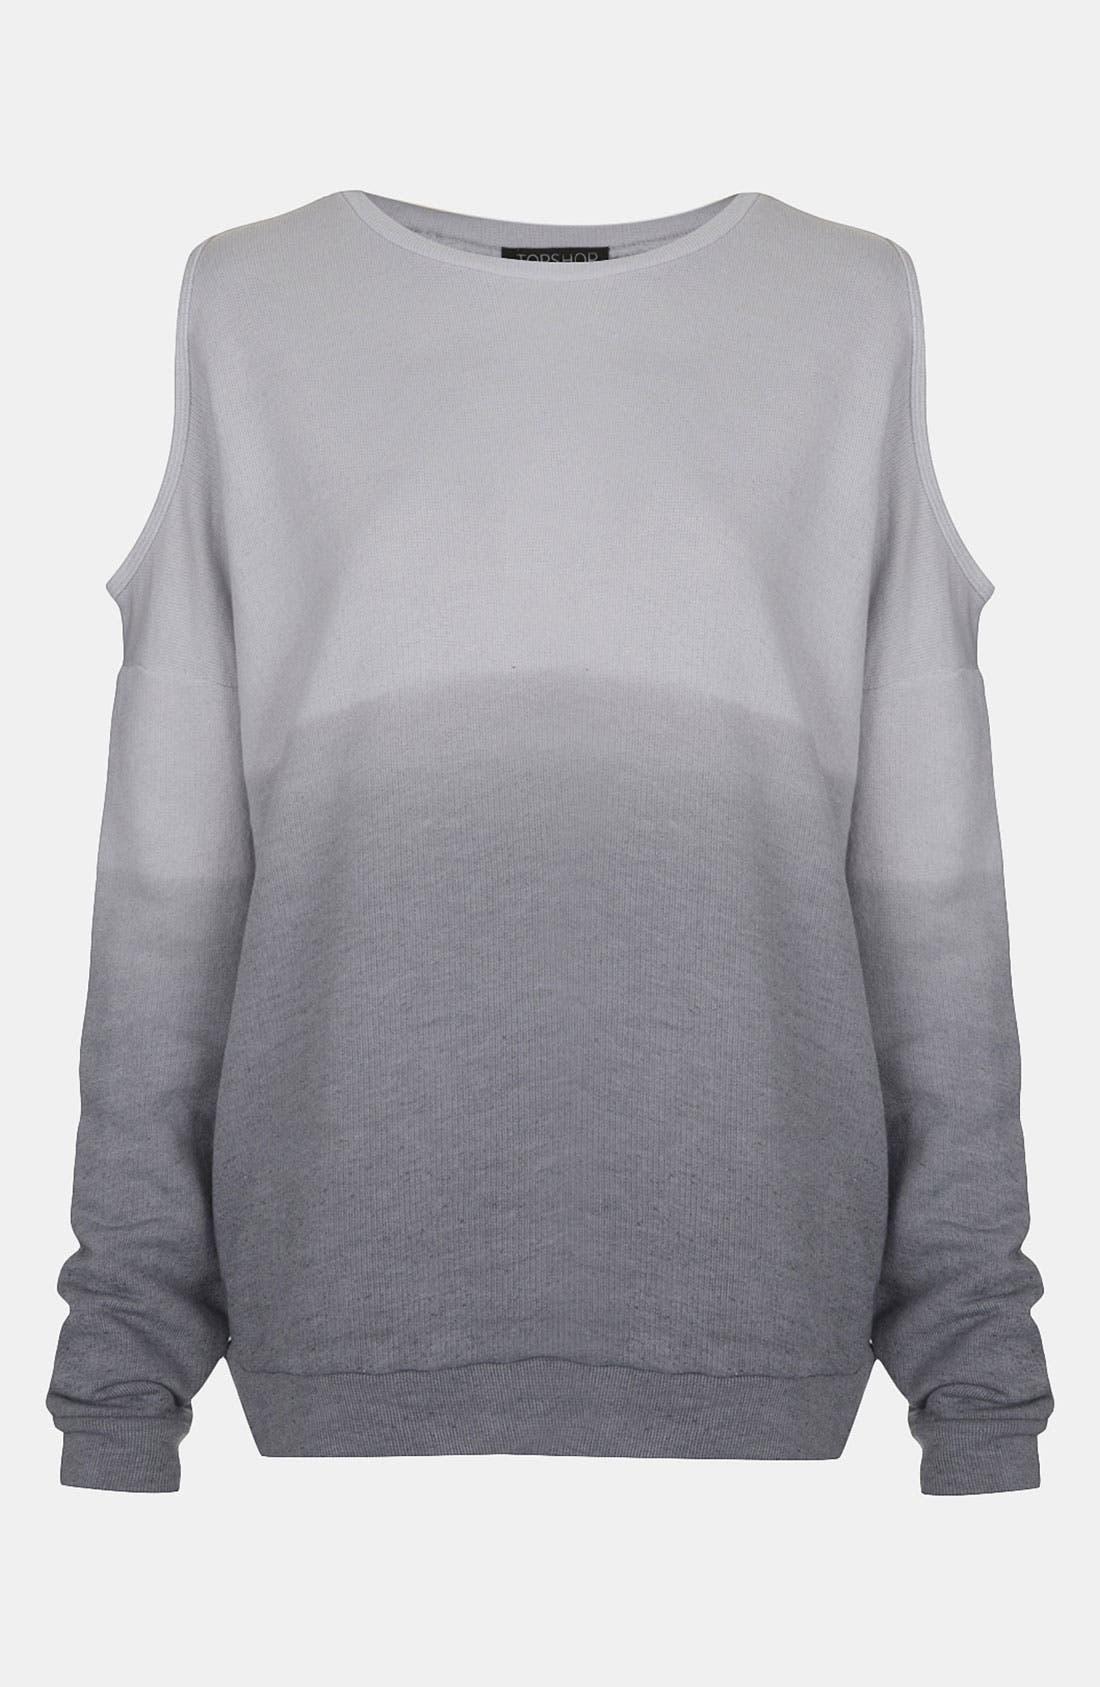 Alternate Image 1 Selected - Topshop Dip Dye Cutout Sweatshirt